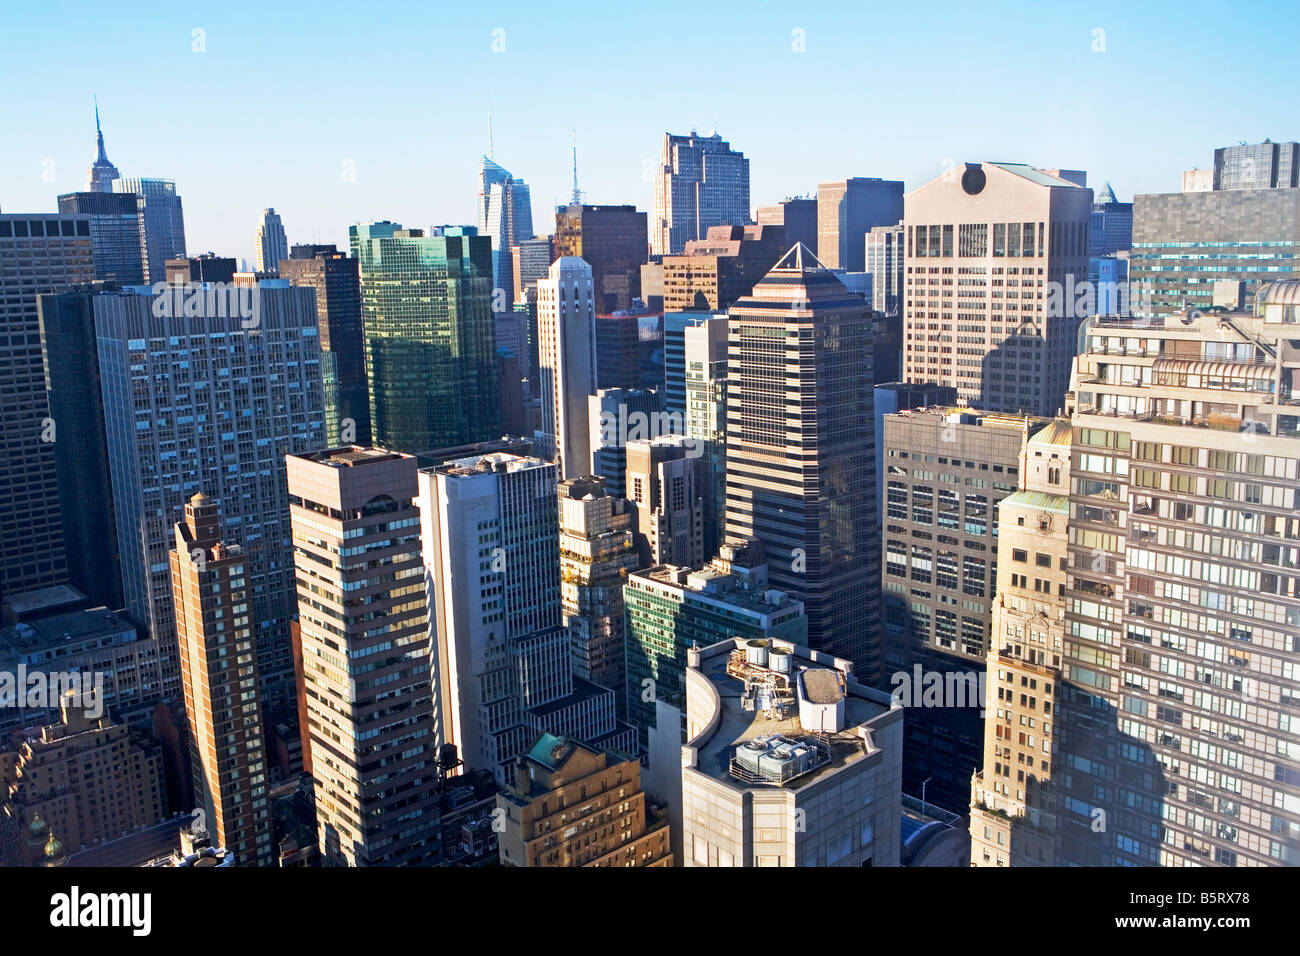 The 10 Best Upper West Side Restaurants New York City